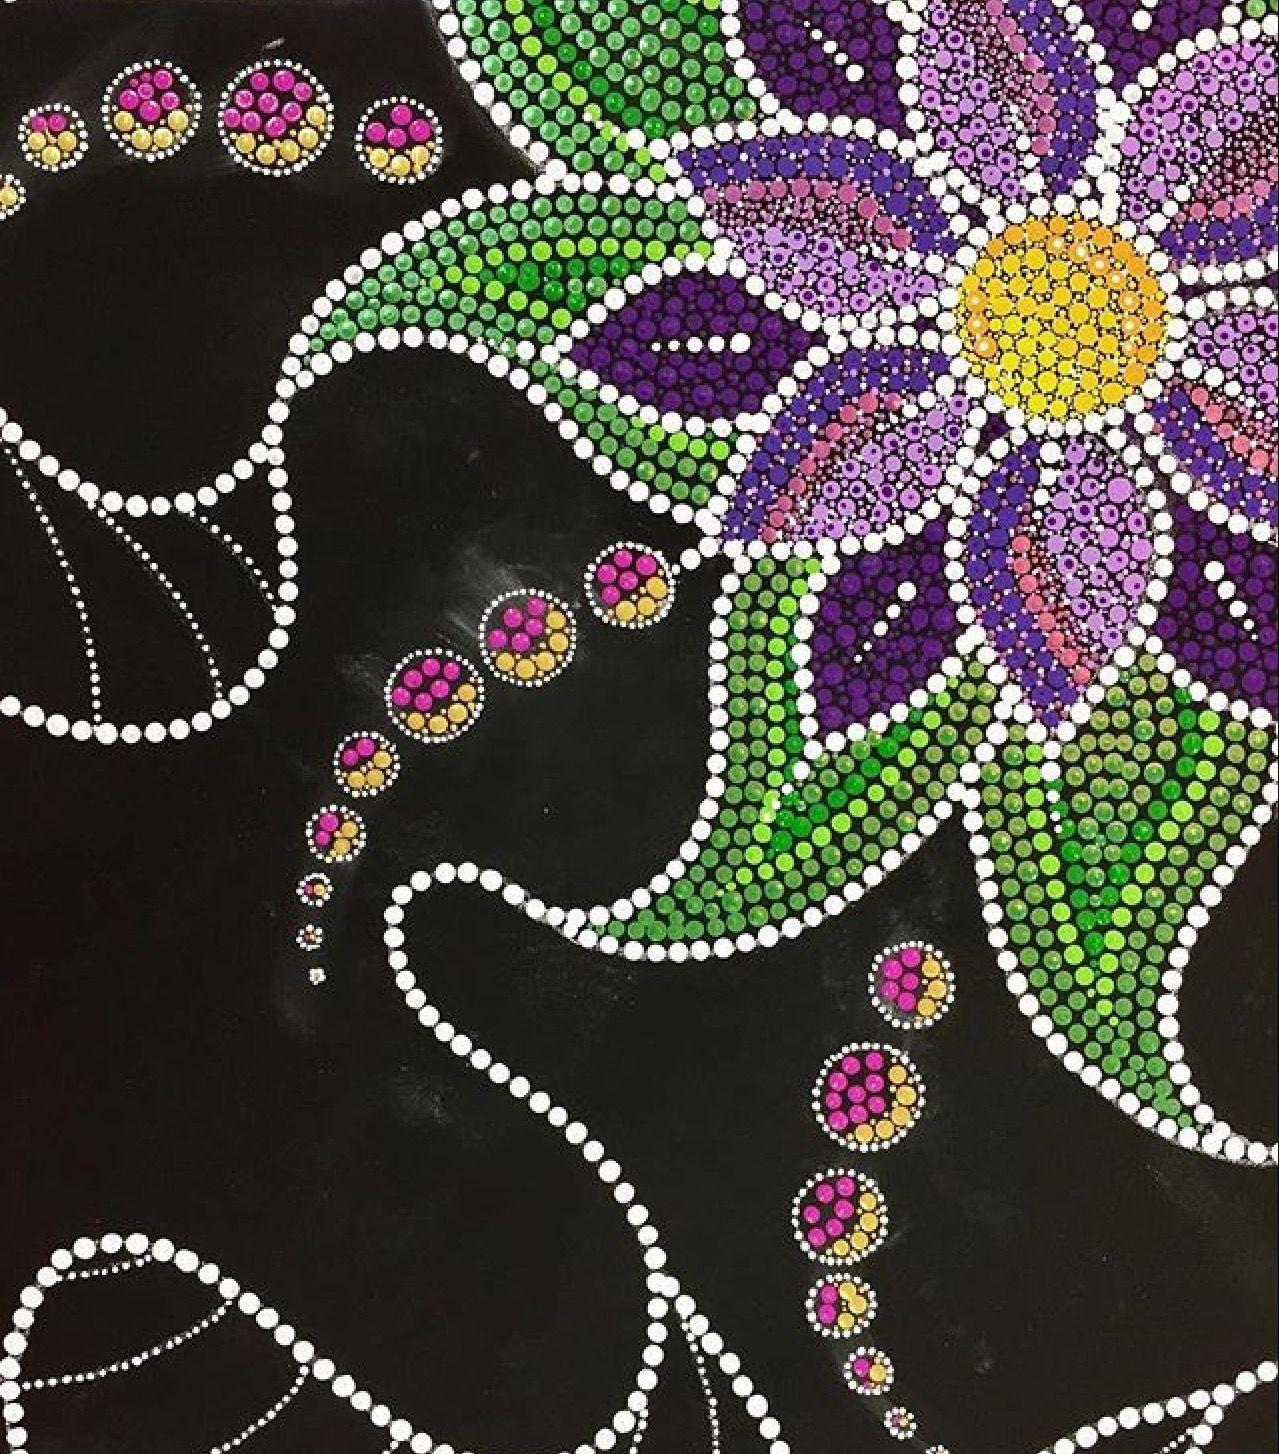 Pin By Kaz Ripper On Dot Painting Pinterest Flower